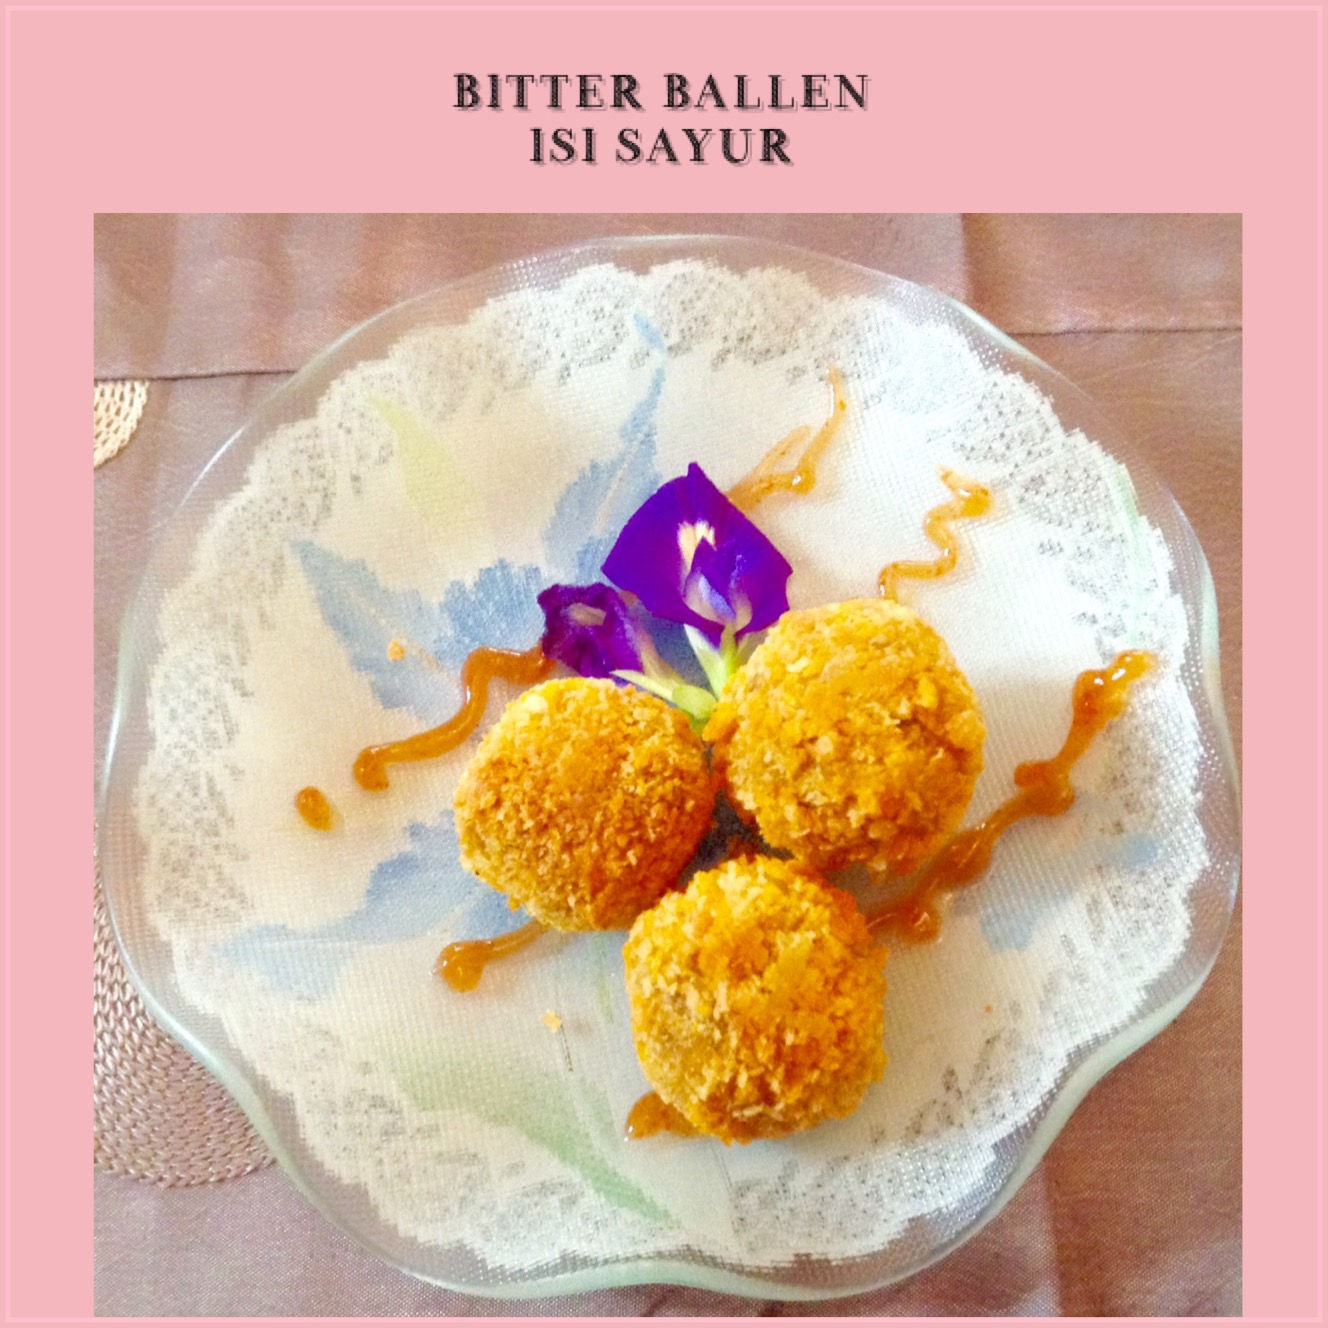 Resep Bitterballen Isi Sayur